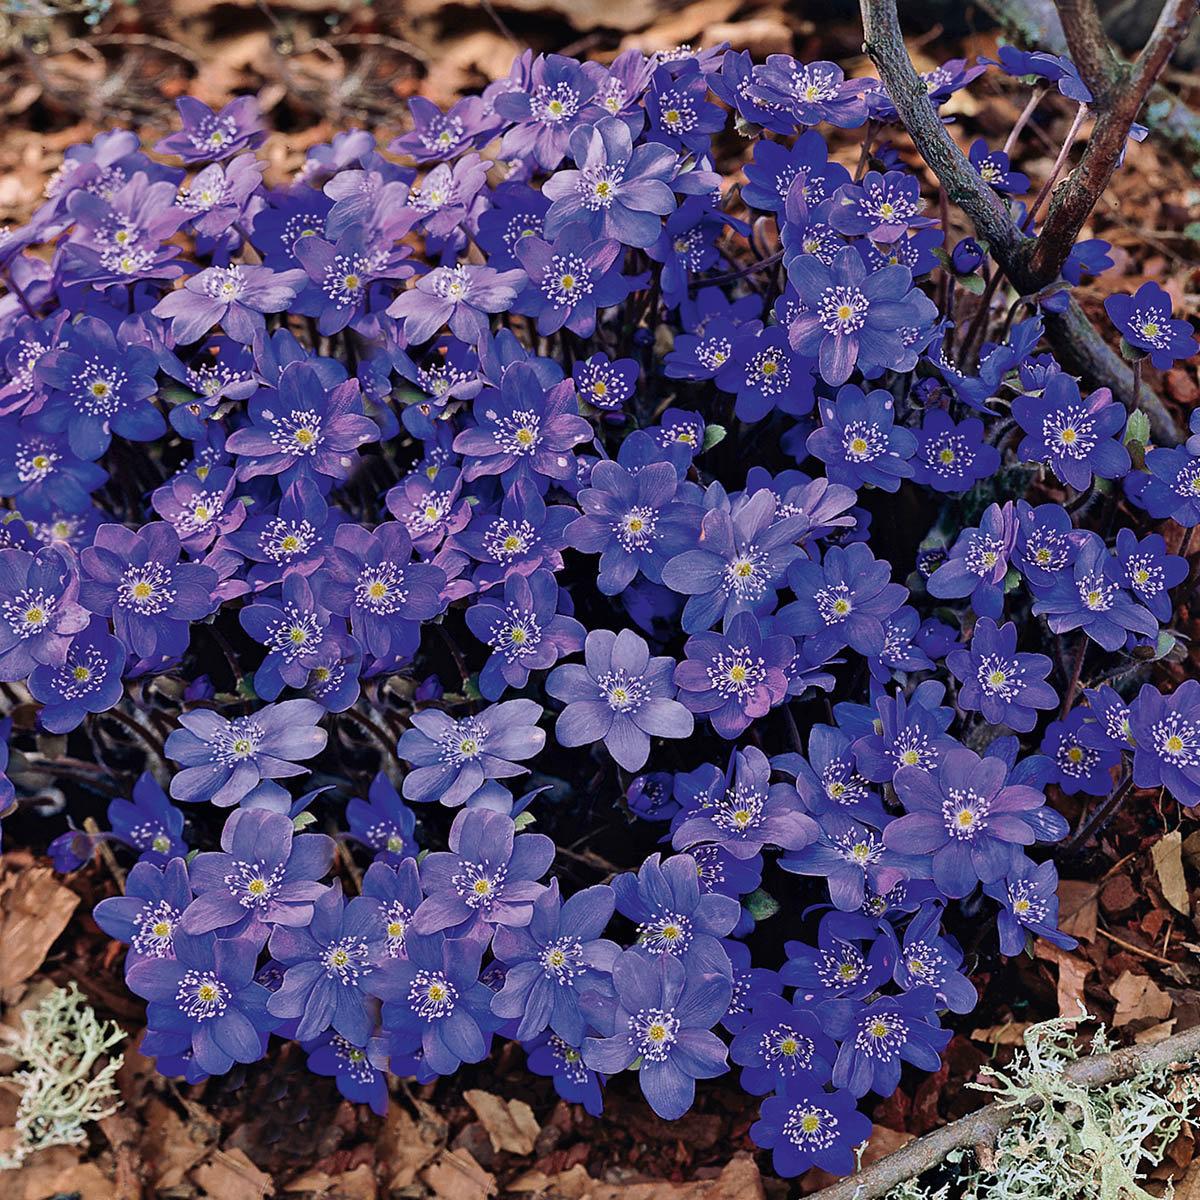 Leberblümchen Blue Jewel